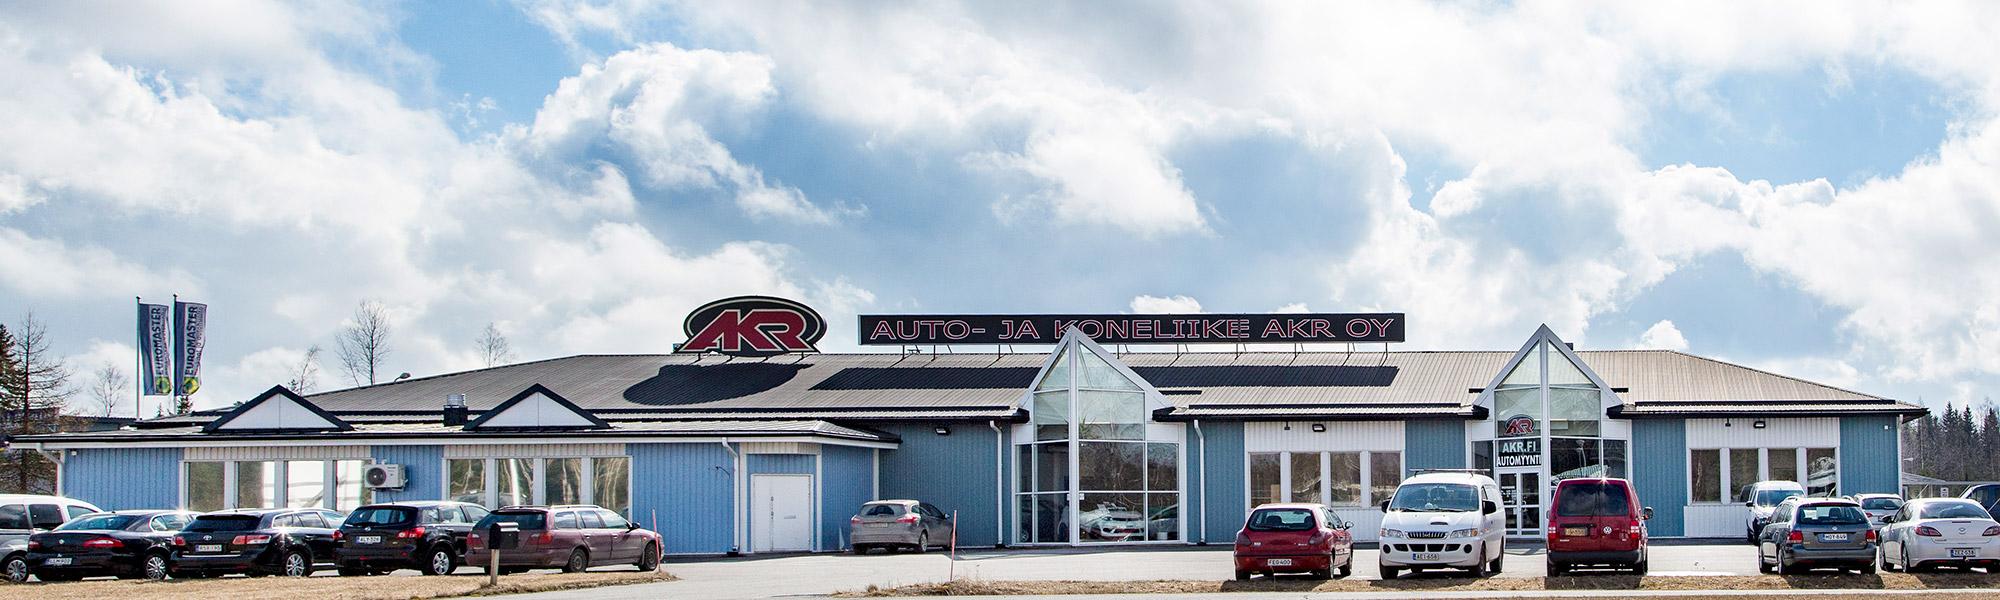 Autokauppa Loimaalla ja Forssassa | Auto- ja koneliike AKR